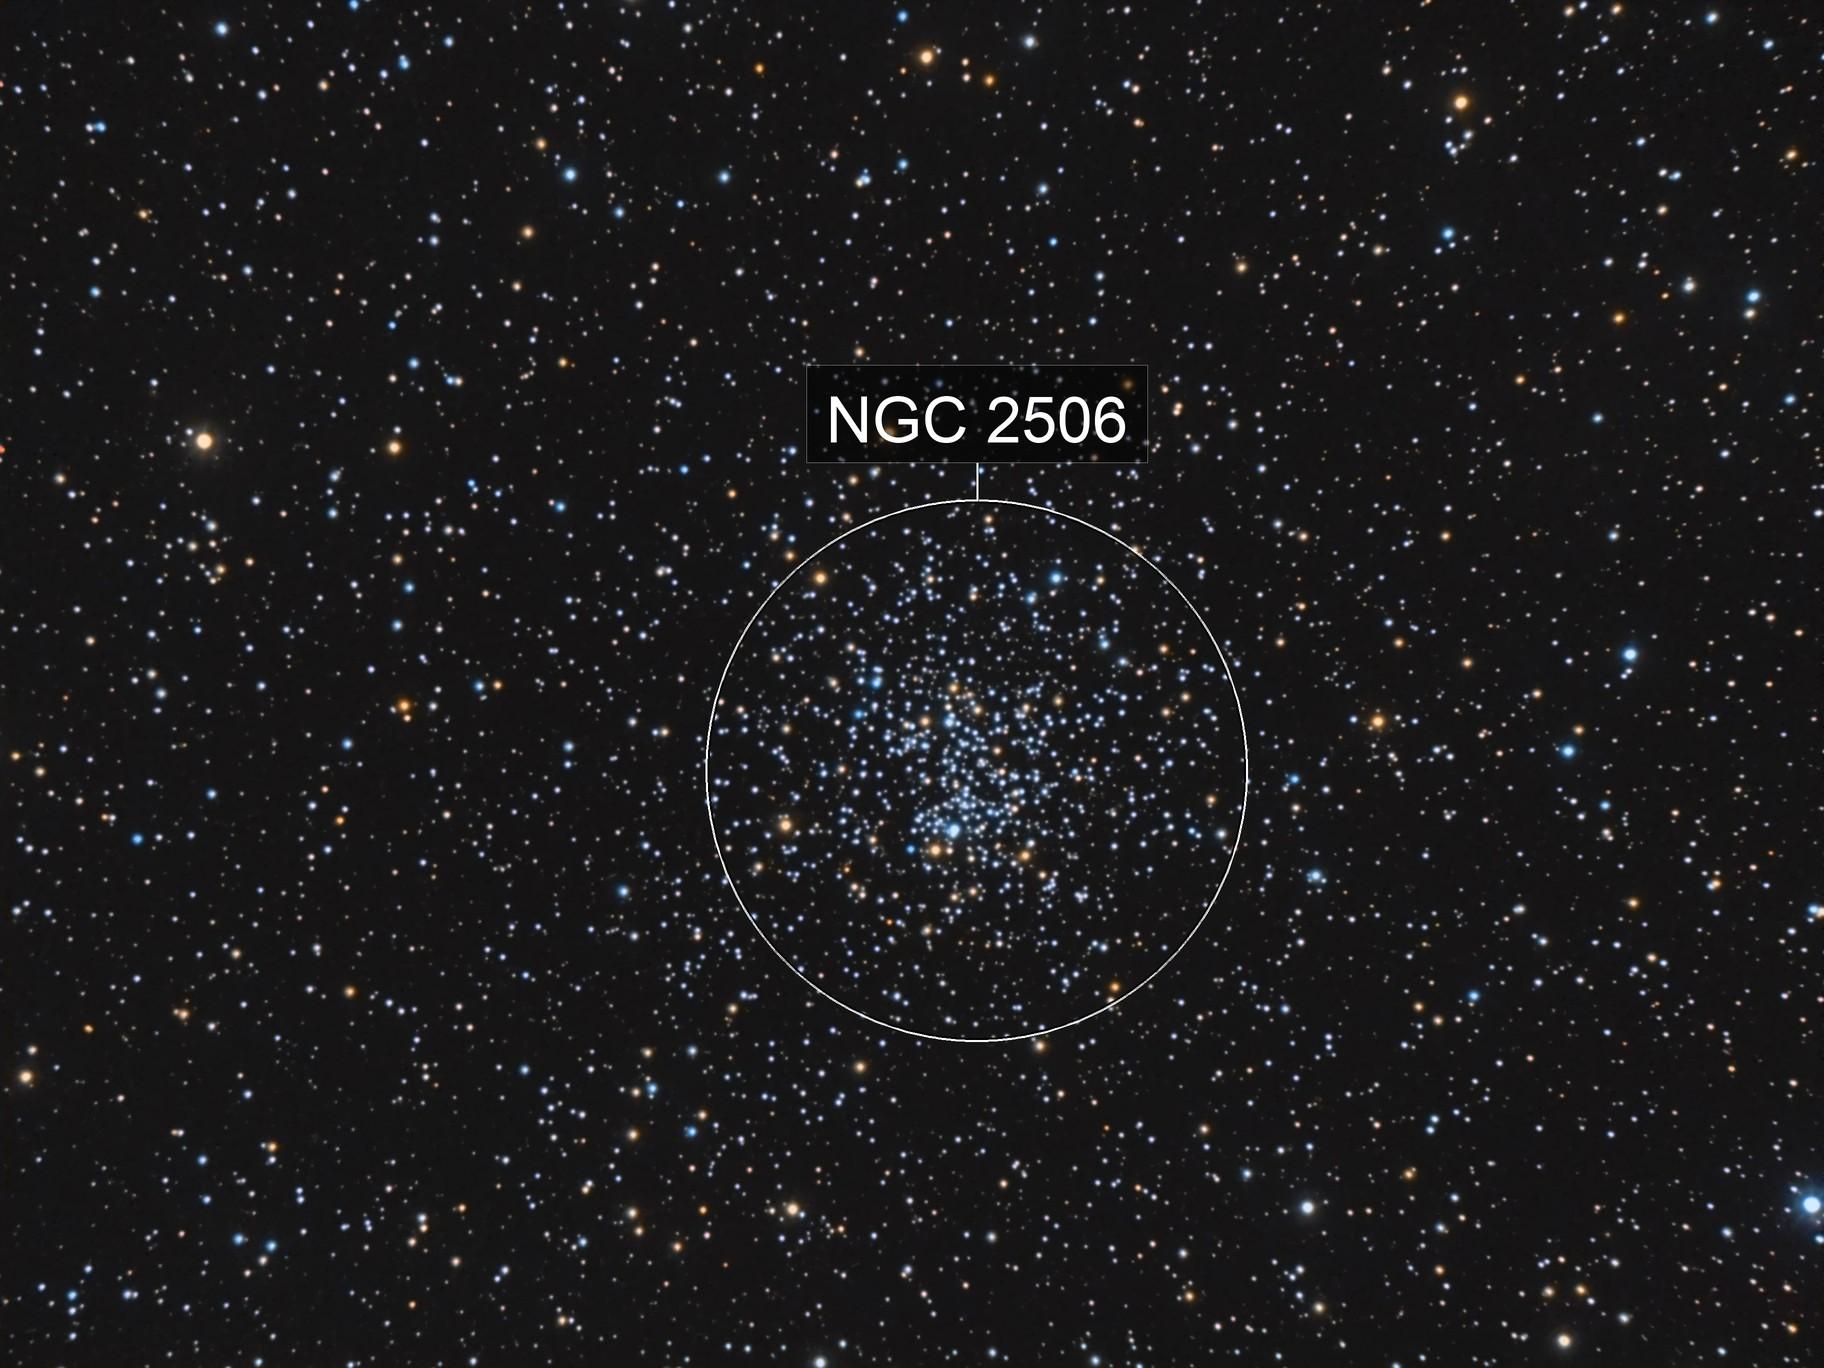 NGC2506 (Melotte 80, Collinder 170)